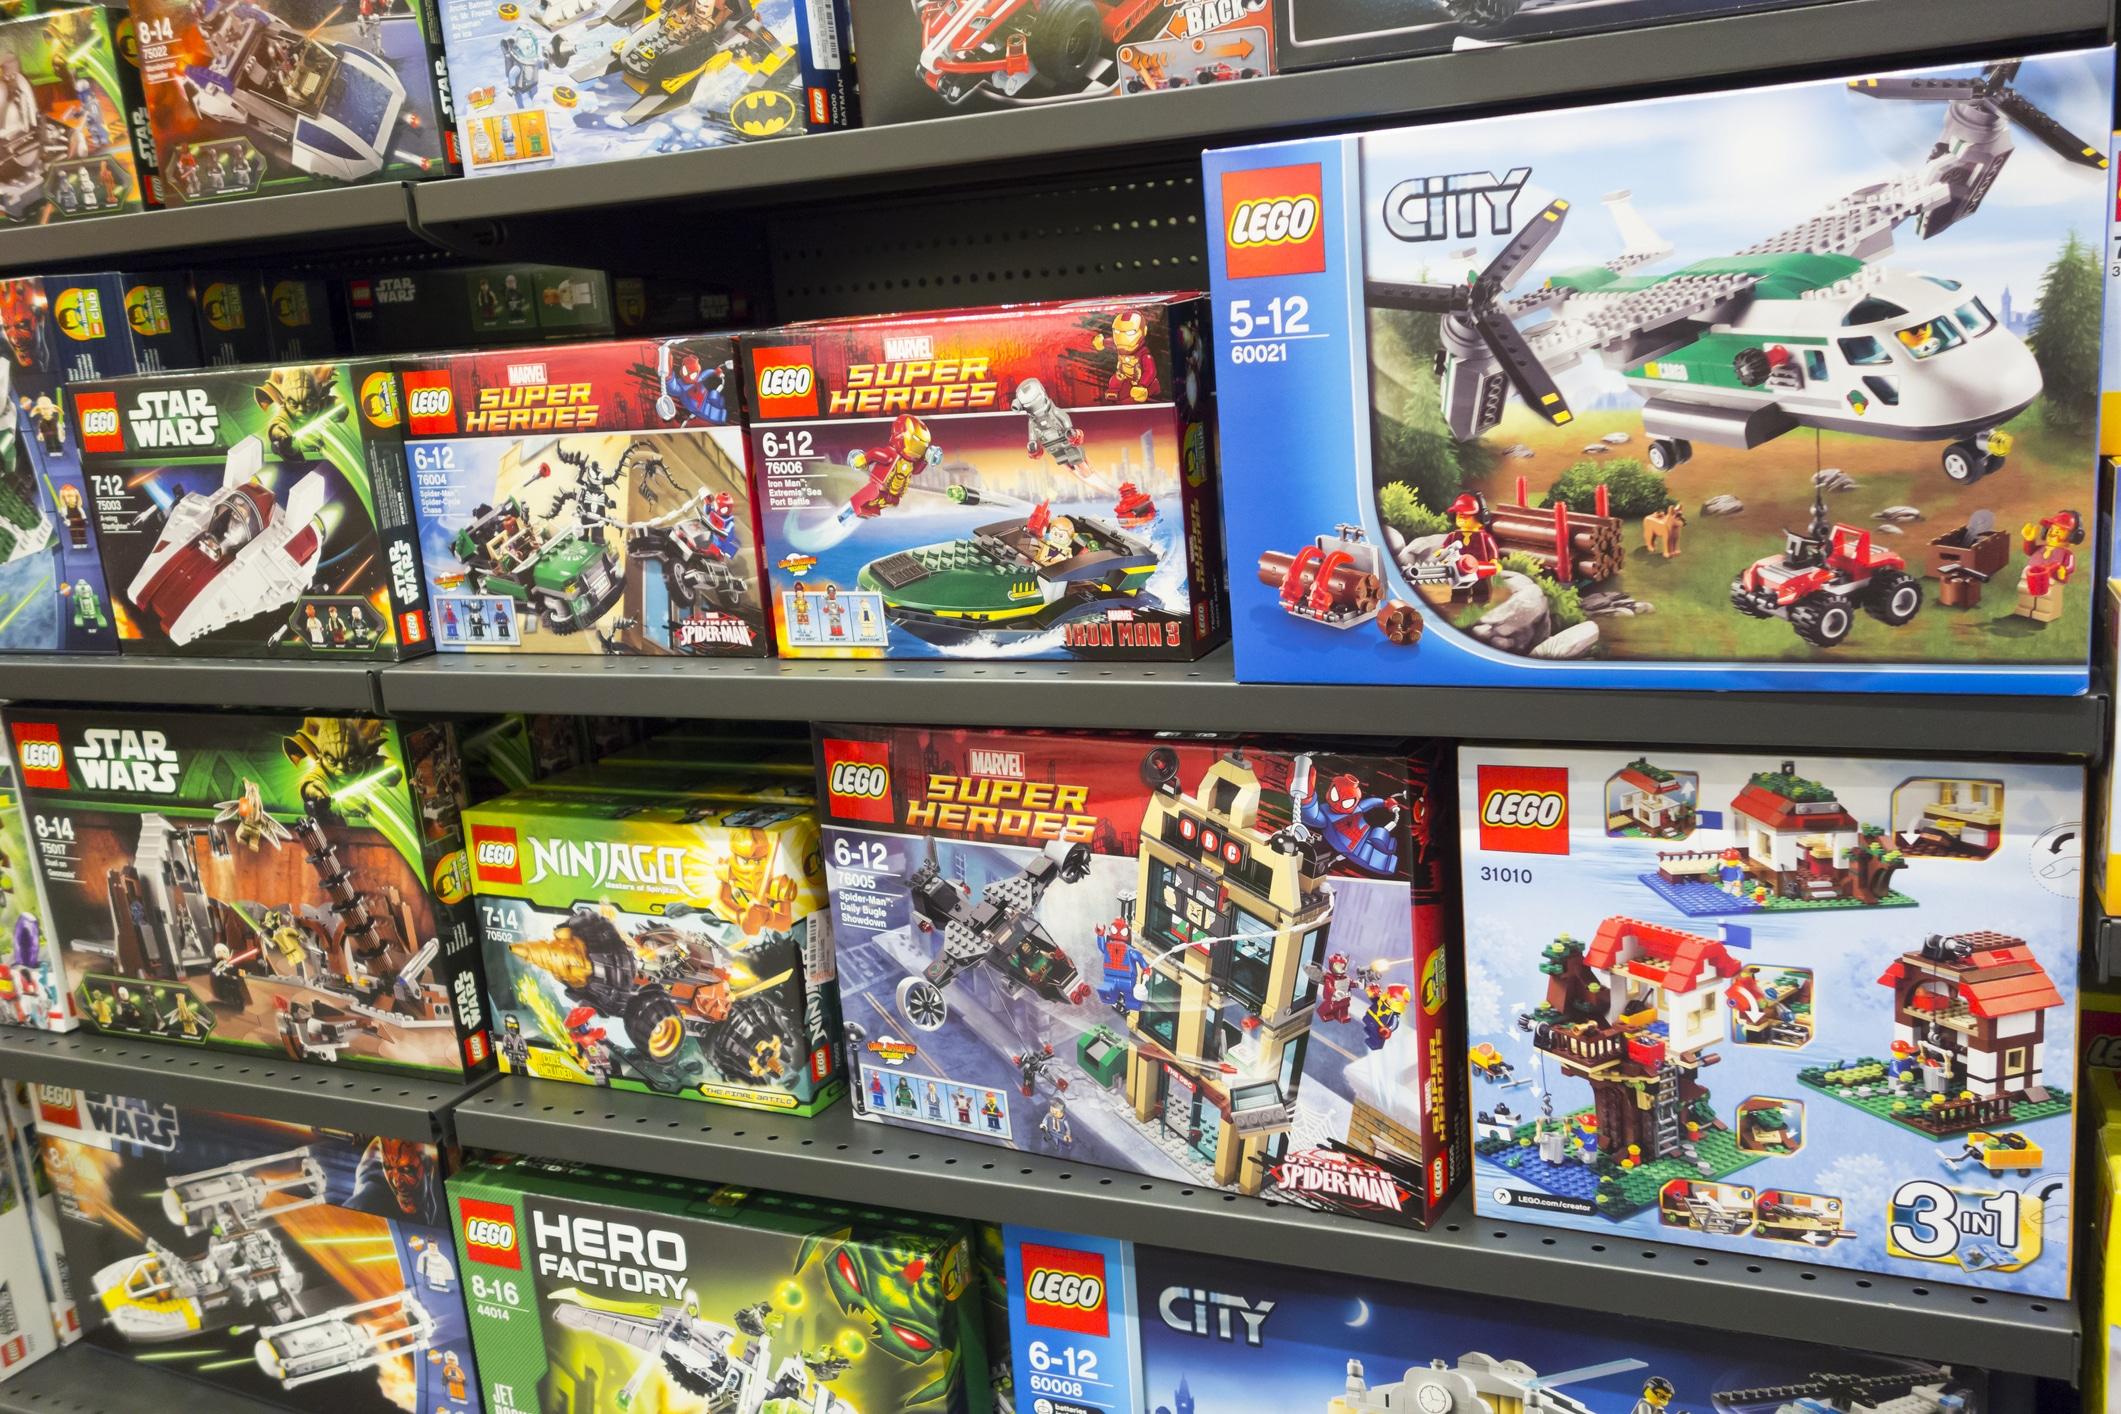 Lego boxes on shelves